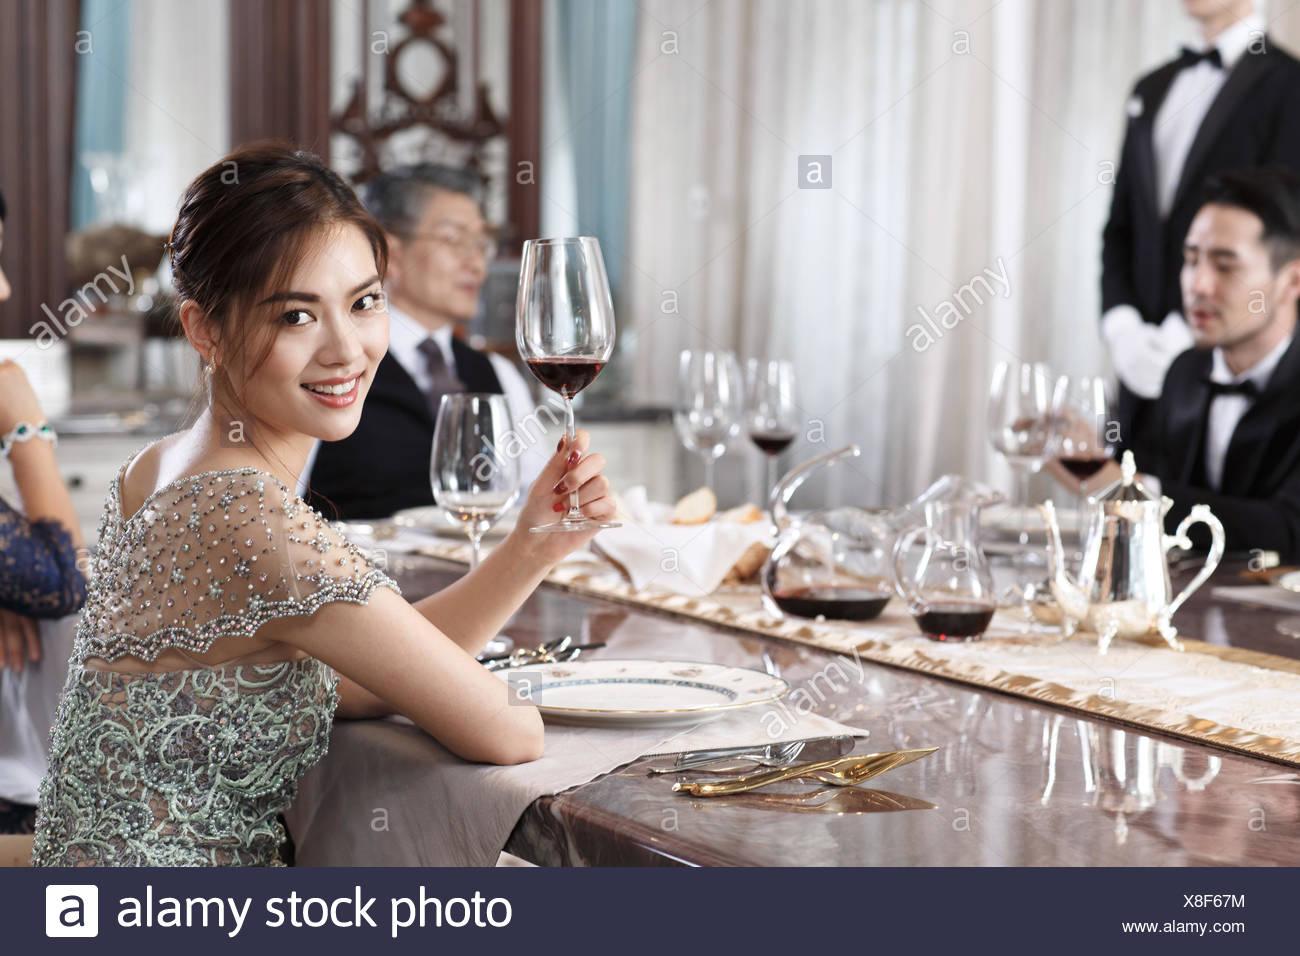 Cena de familia aristocrática. Imagen De Stock